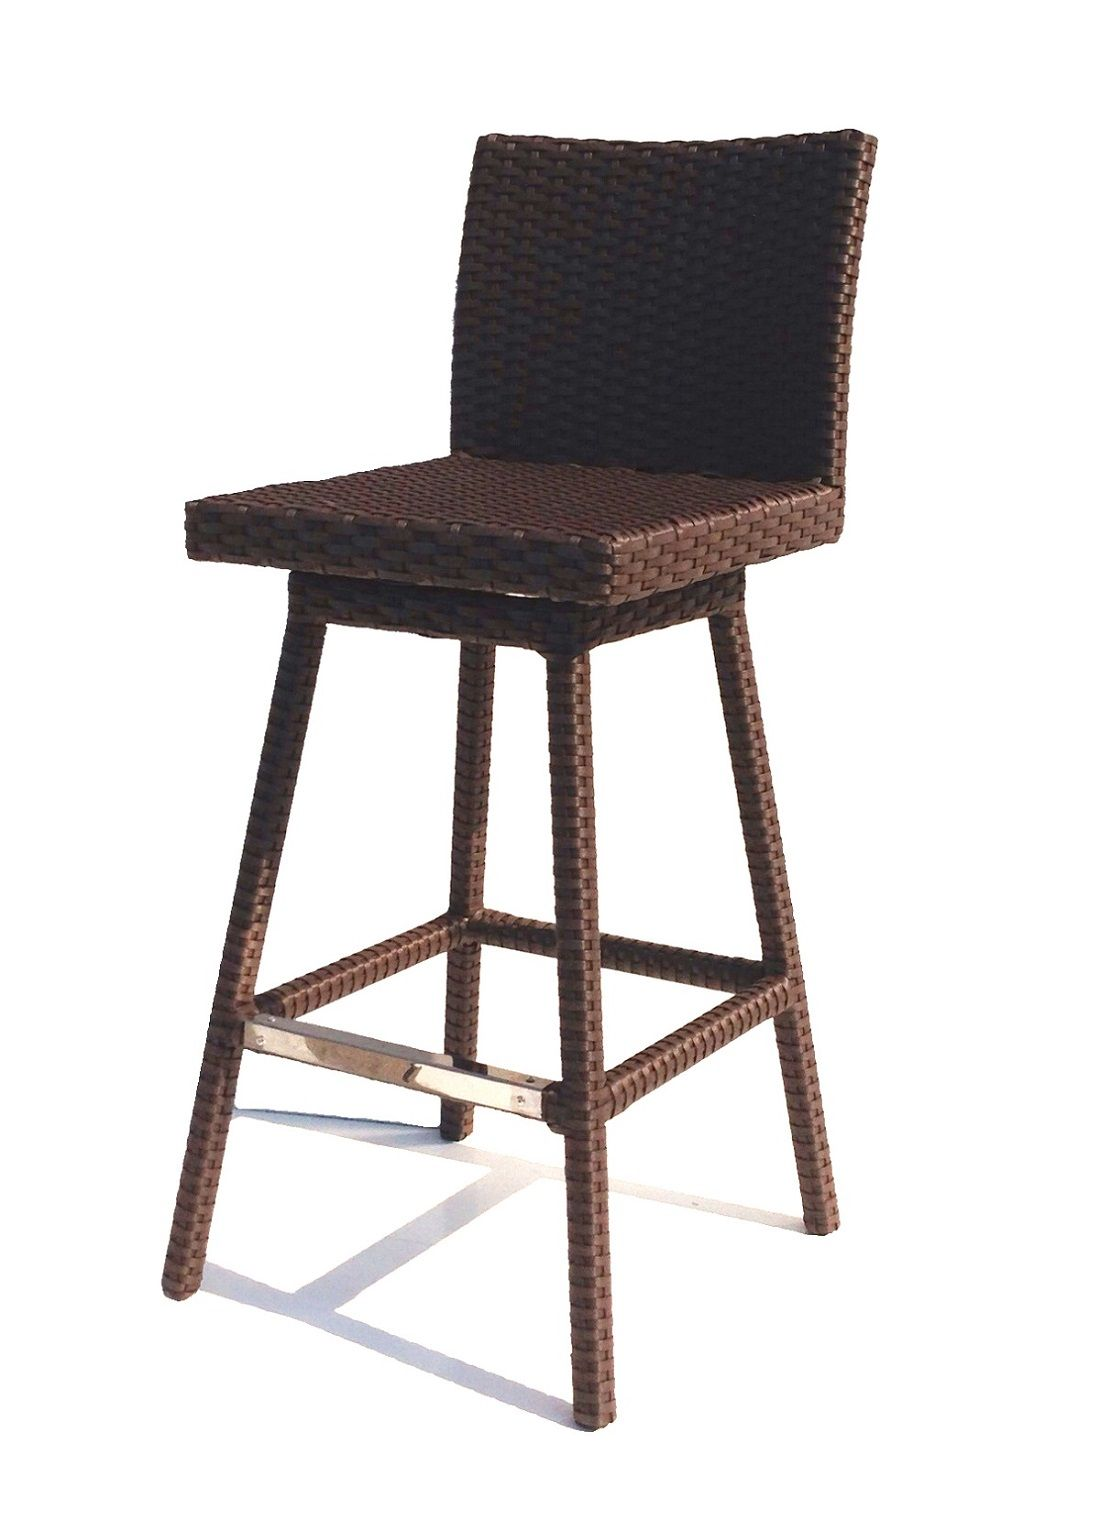 outdoor swivel bar stools Sonoma Outdoor Wicker Swivel Barstool | Pinterest | Footrest  outdoor swivel bar stools